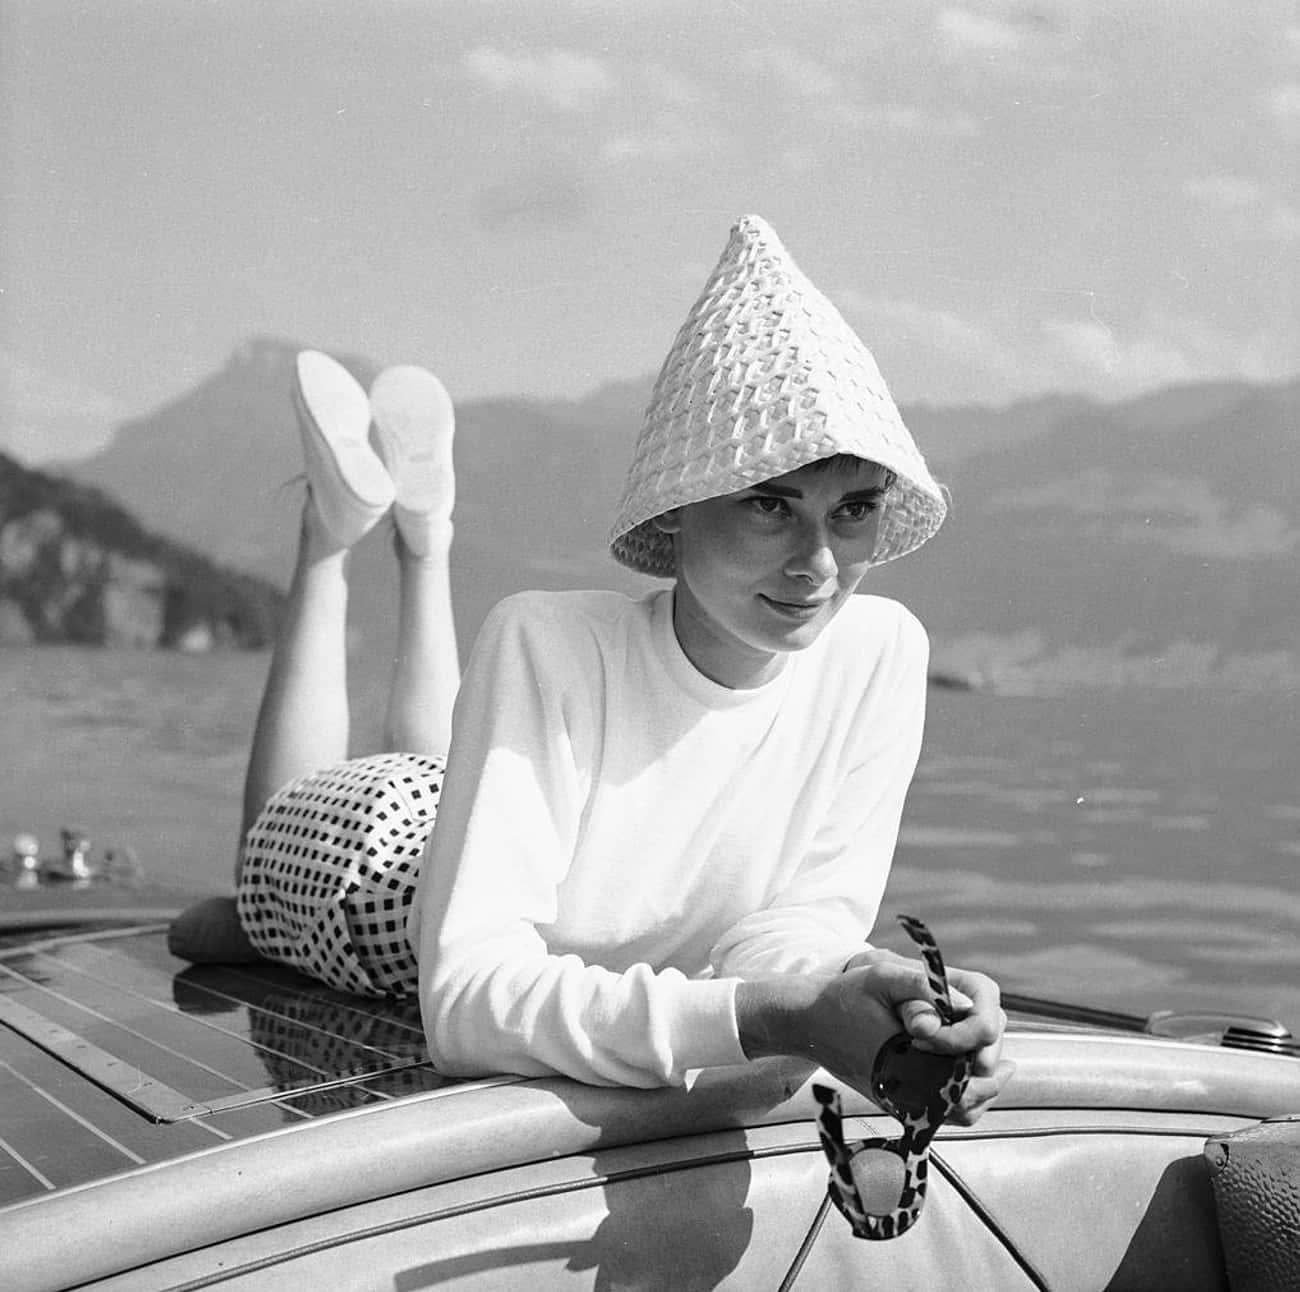 Audrey Hepburn Was A Part Of The Dutch Resistance As A Child